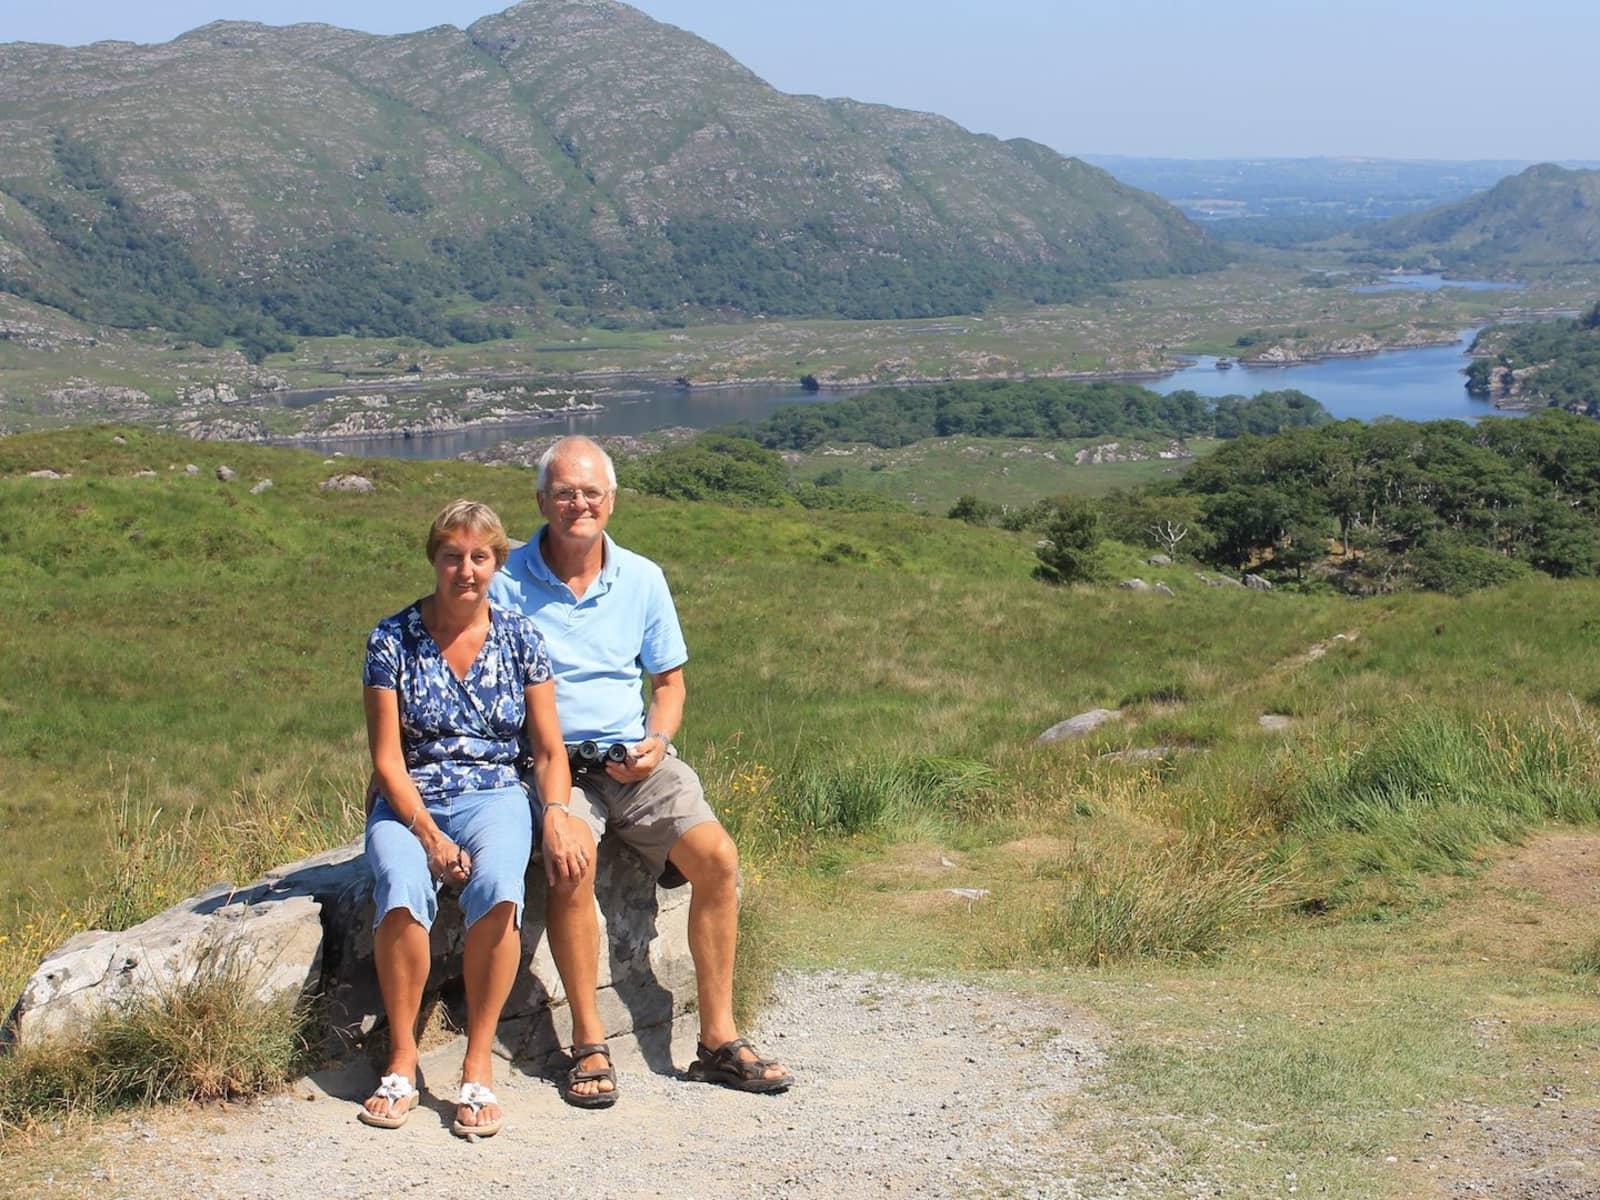 Philip & Elaine from Harrogate, United Kingdom